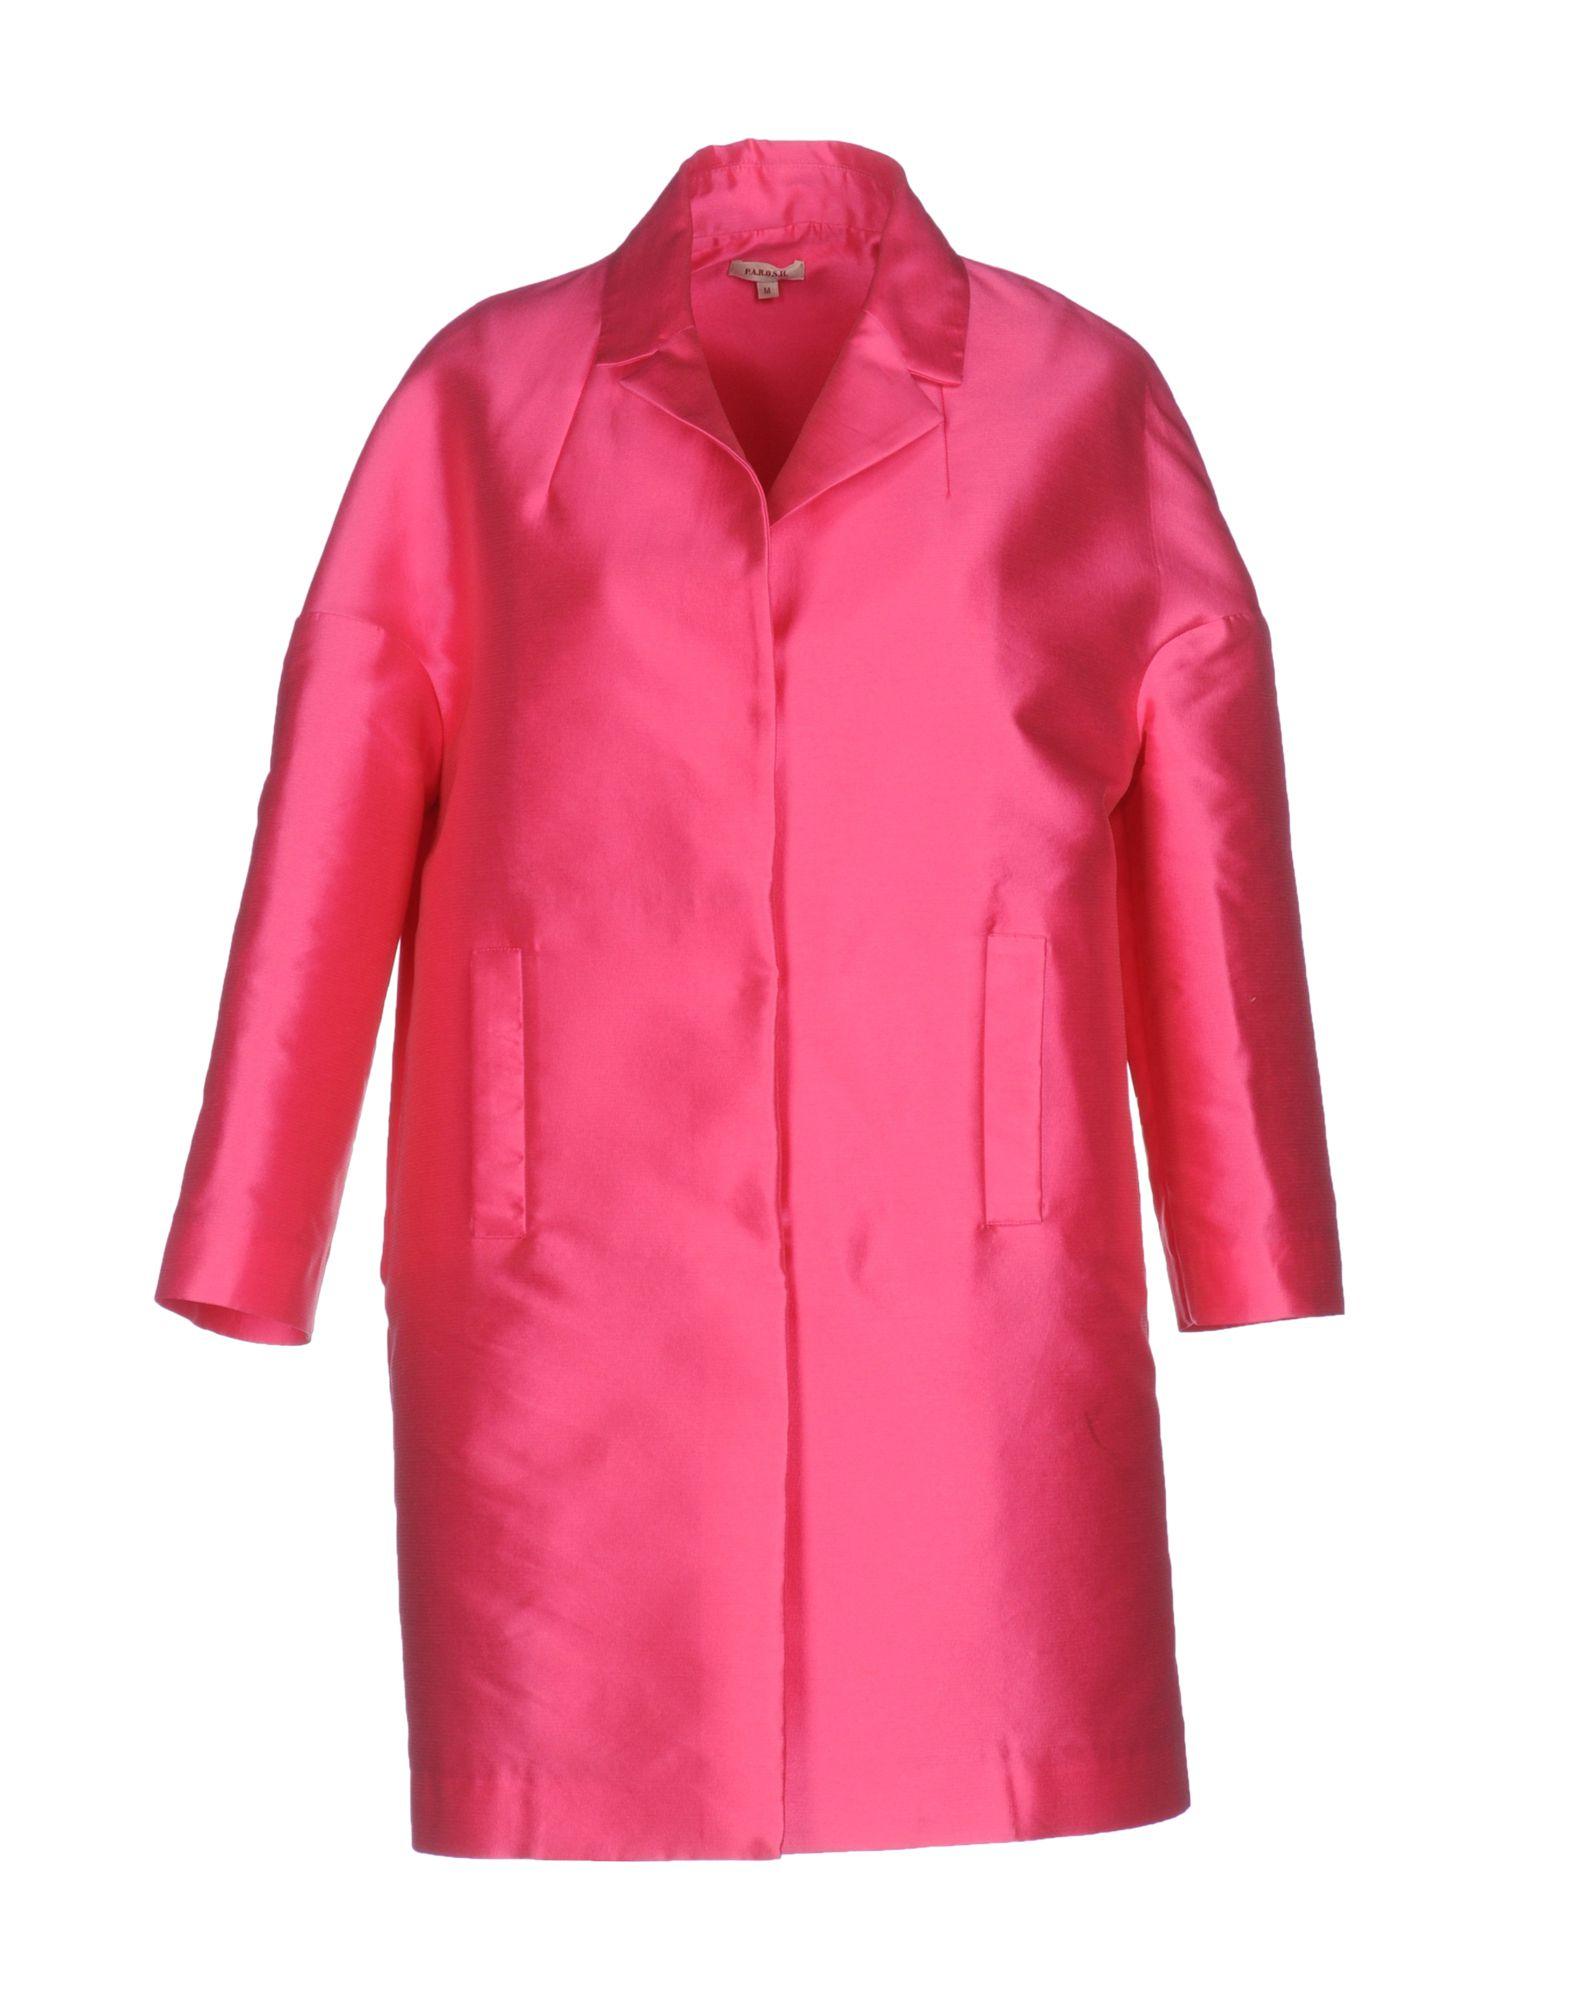 ФОТО p.a.r.o.s.h. легкое пальто